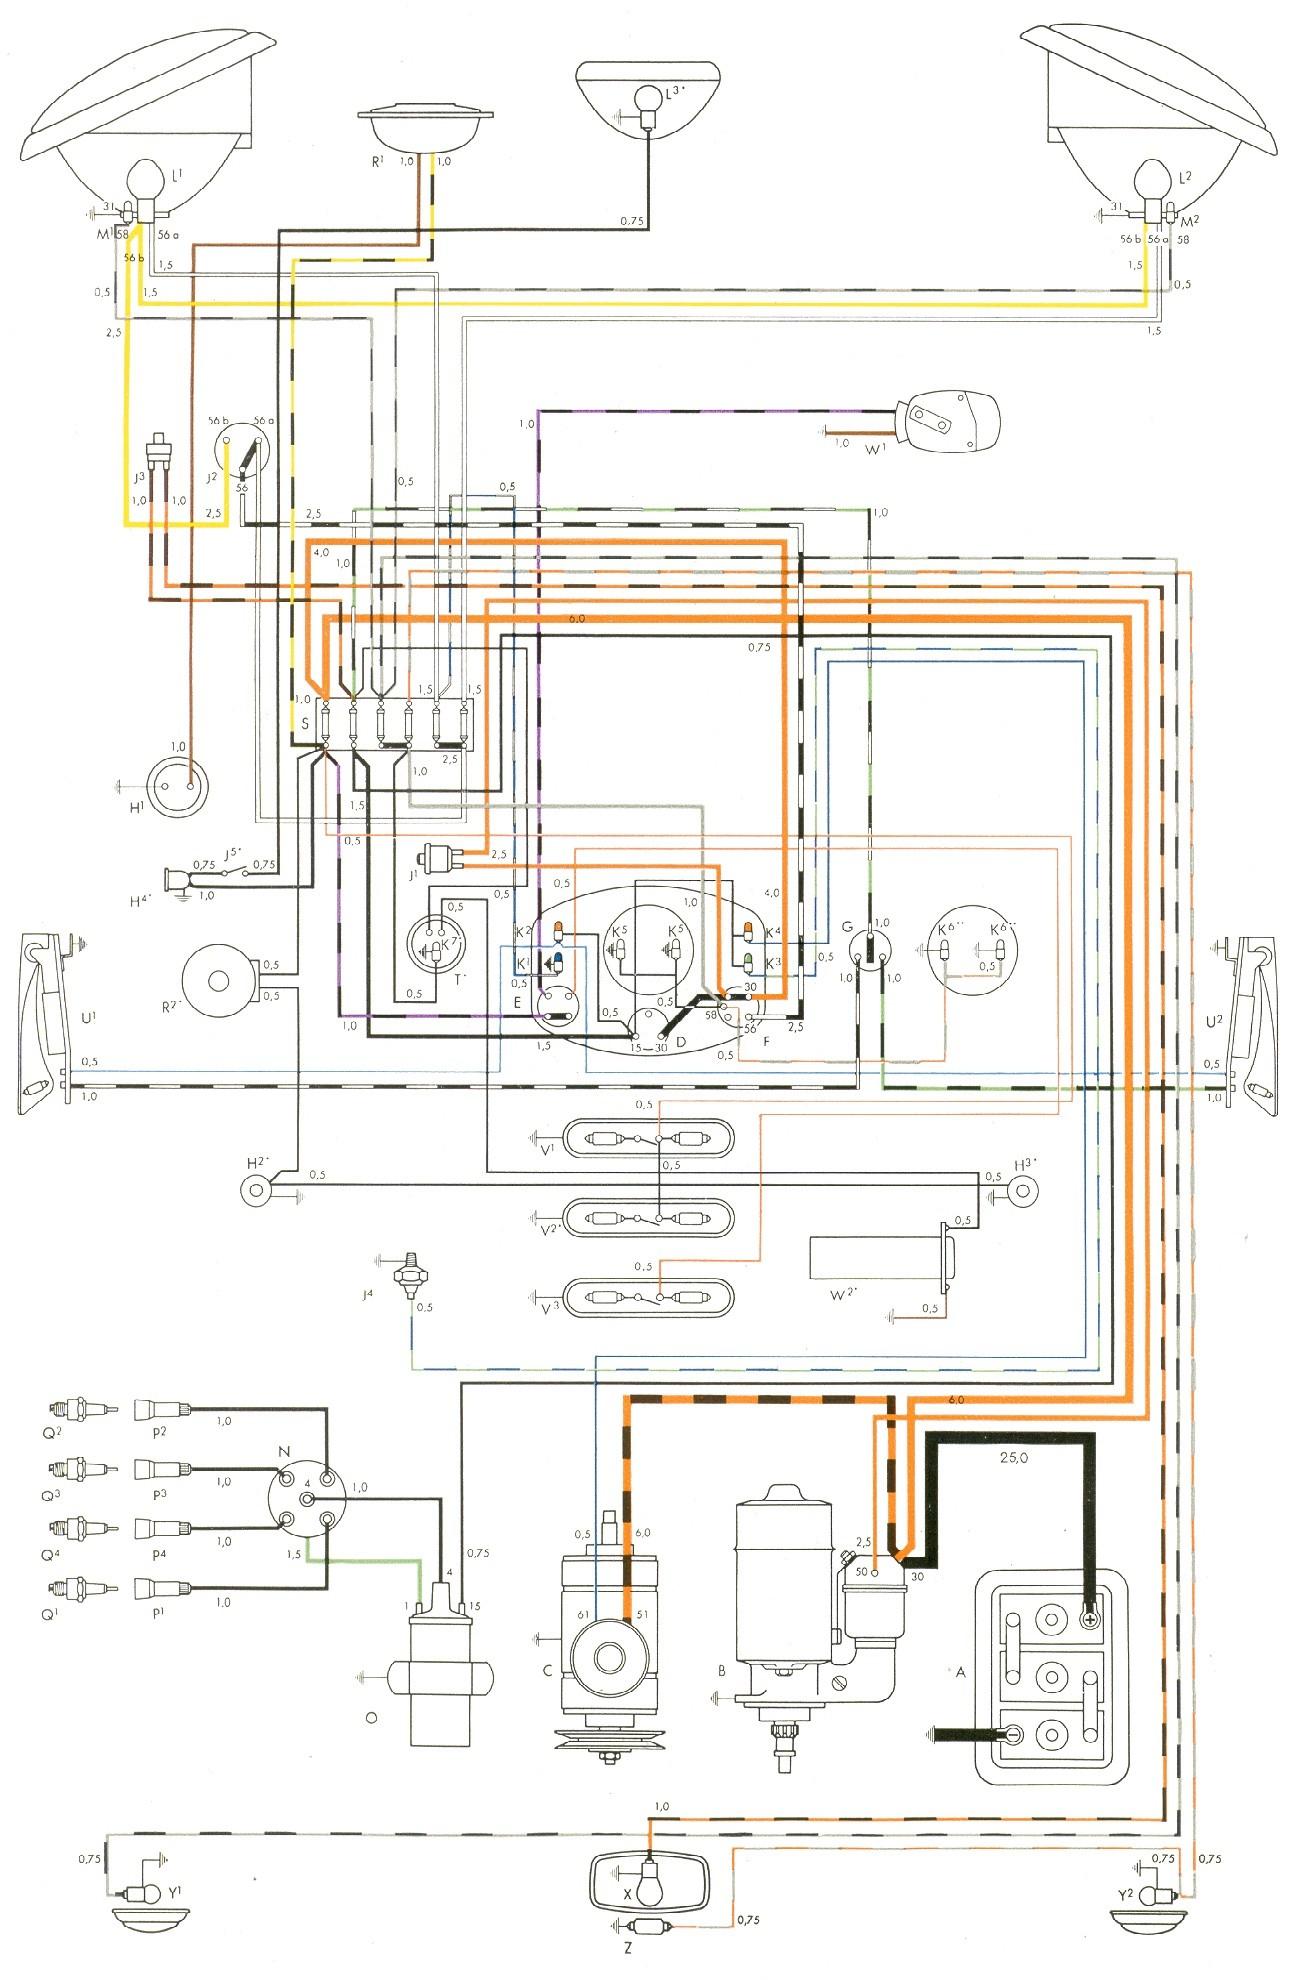 2000 vw beetle engine diagram mitsubishi 2 4l wiring library